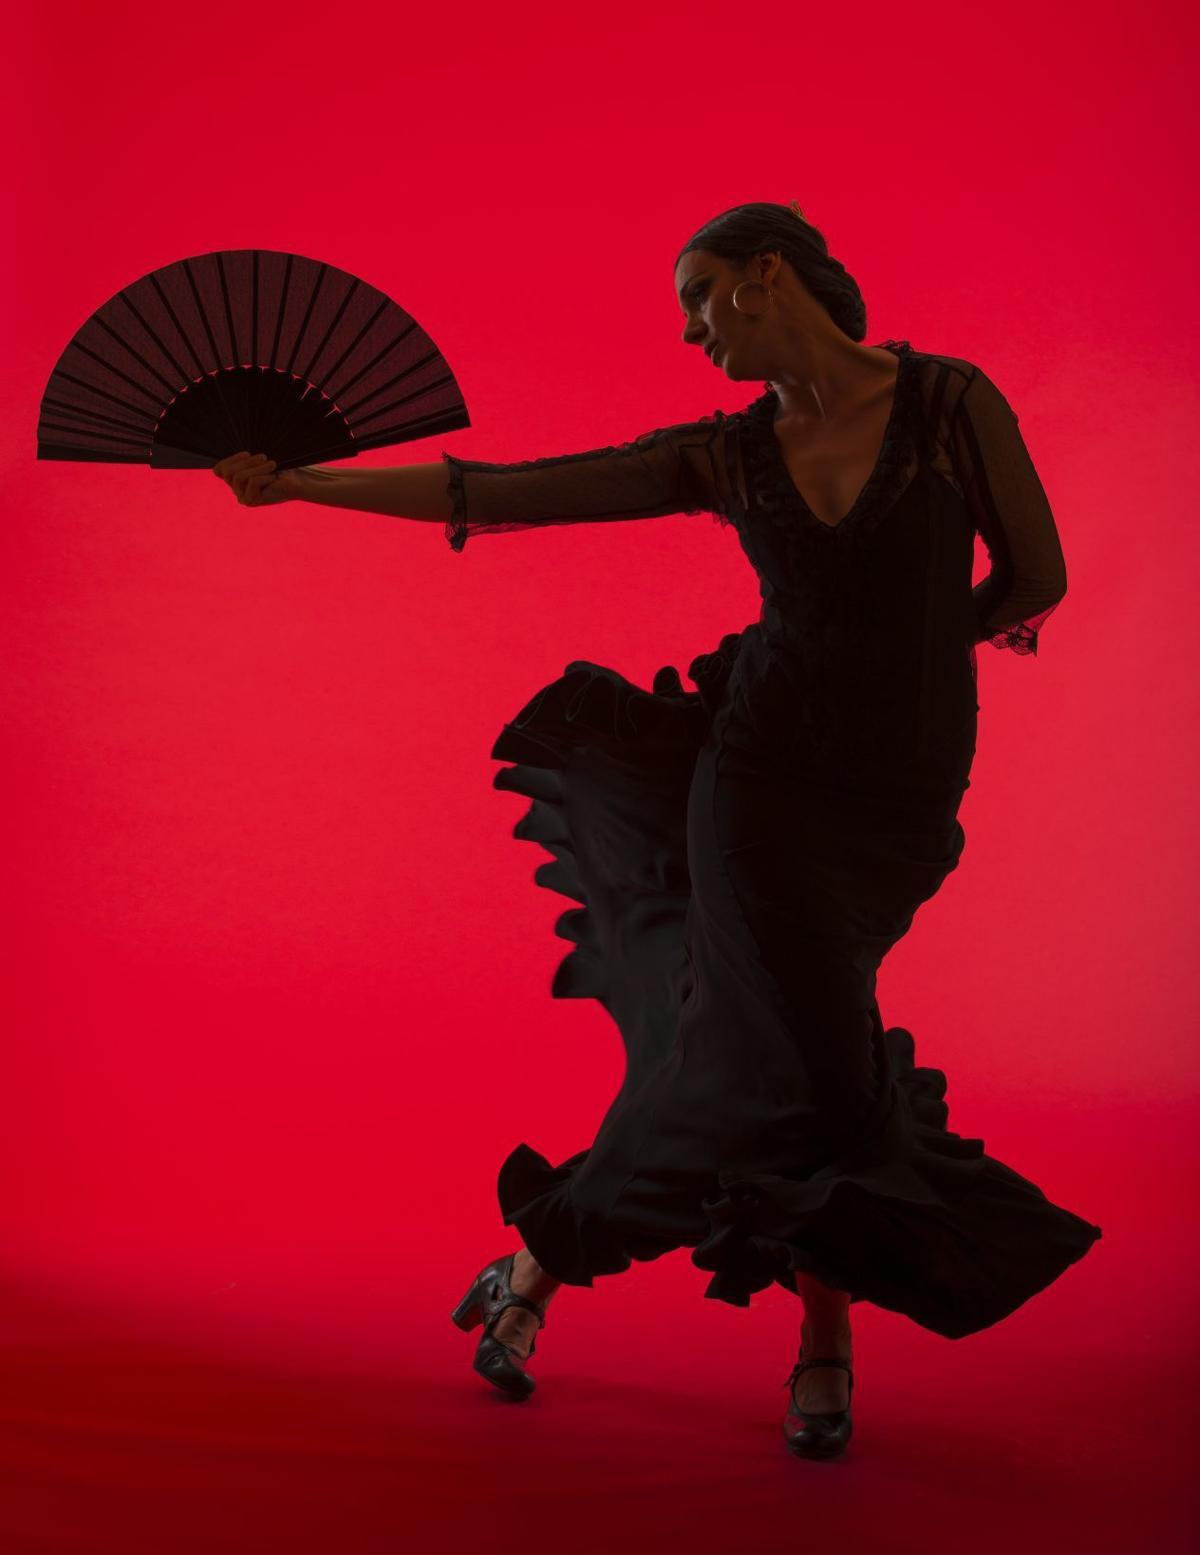 Savannah Fuentes, Flamenco dancer